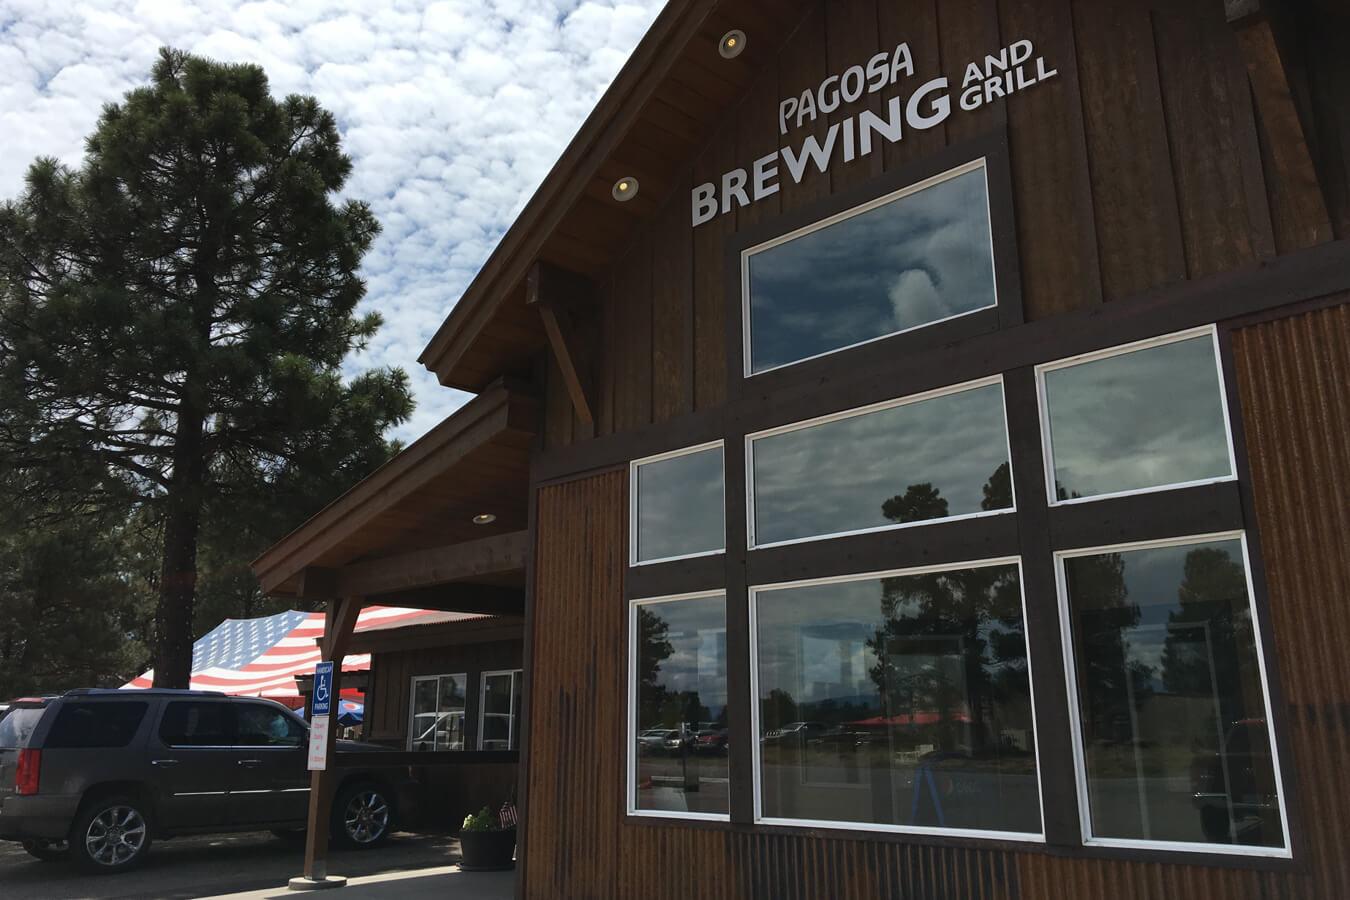 Pagosa Brewing Company & Grill